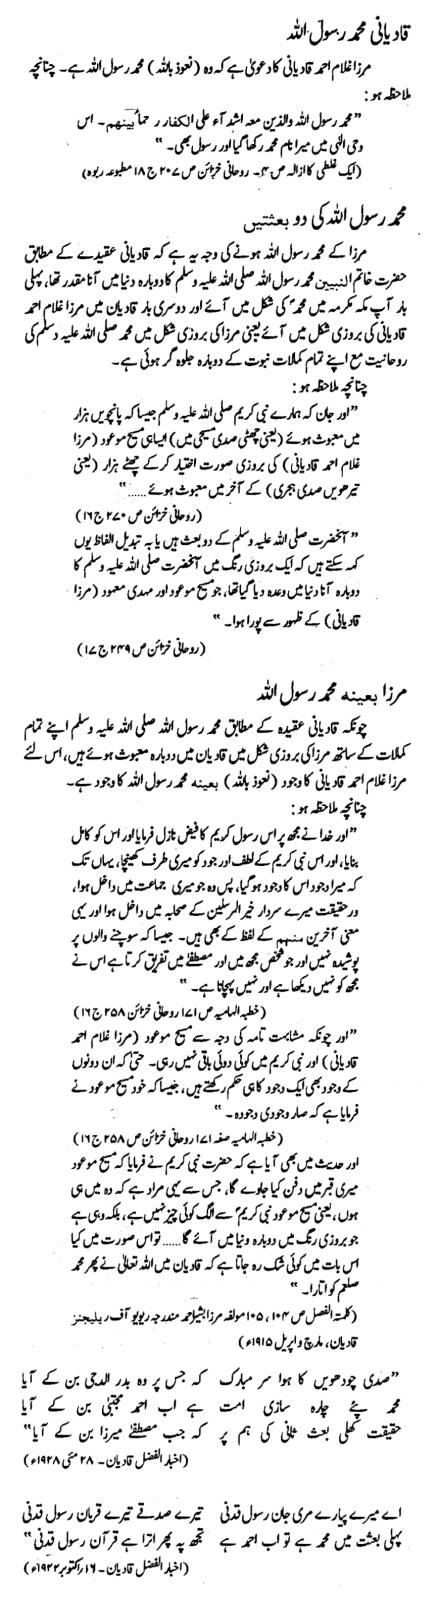 Qadyani Muhmmad Rasool Allah.png